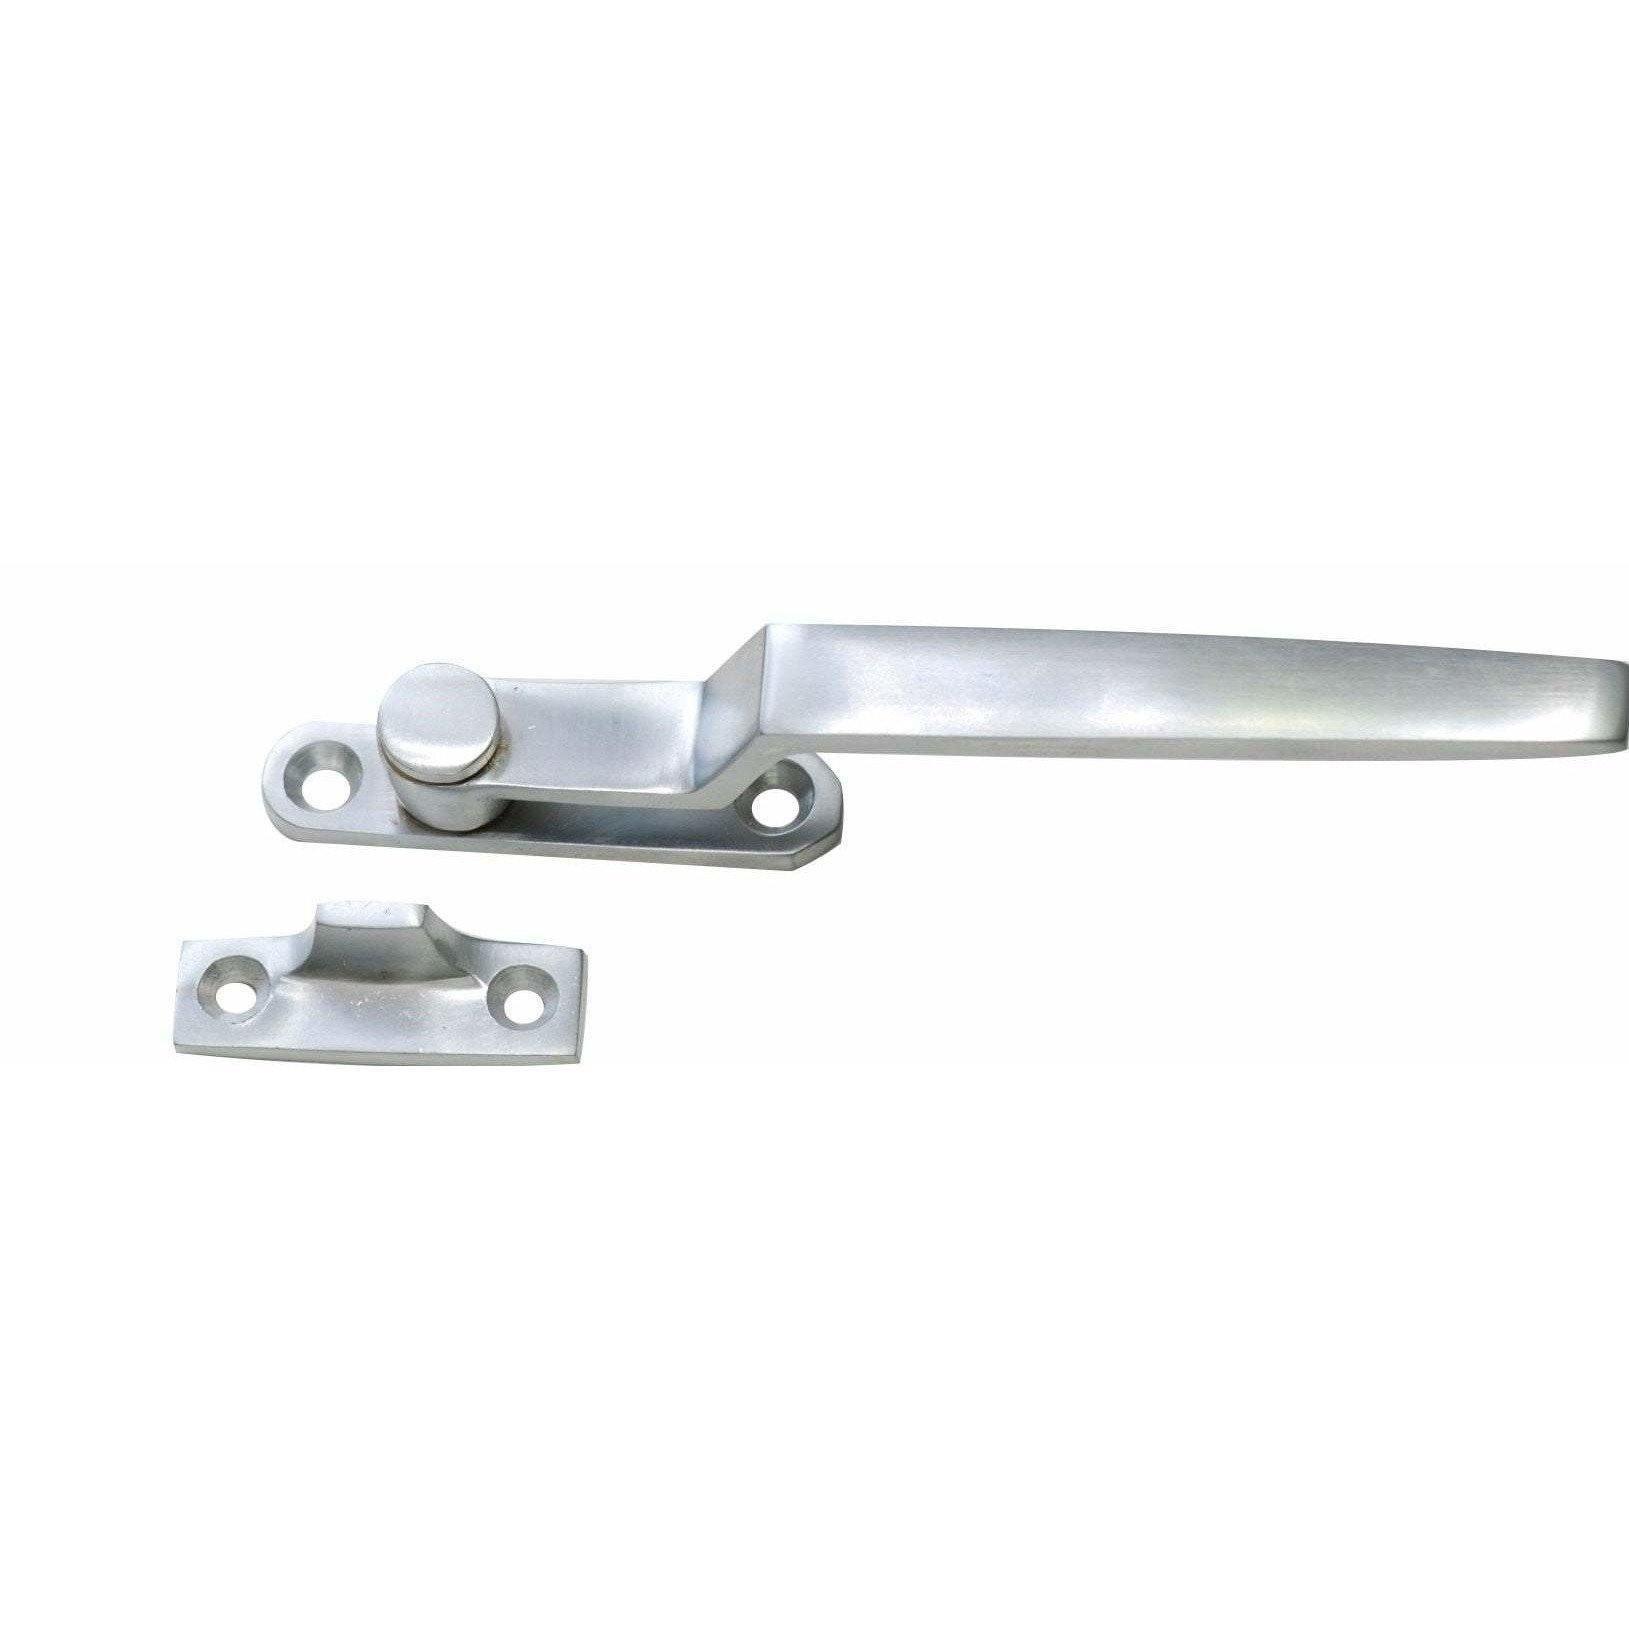 Square flat window handle